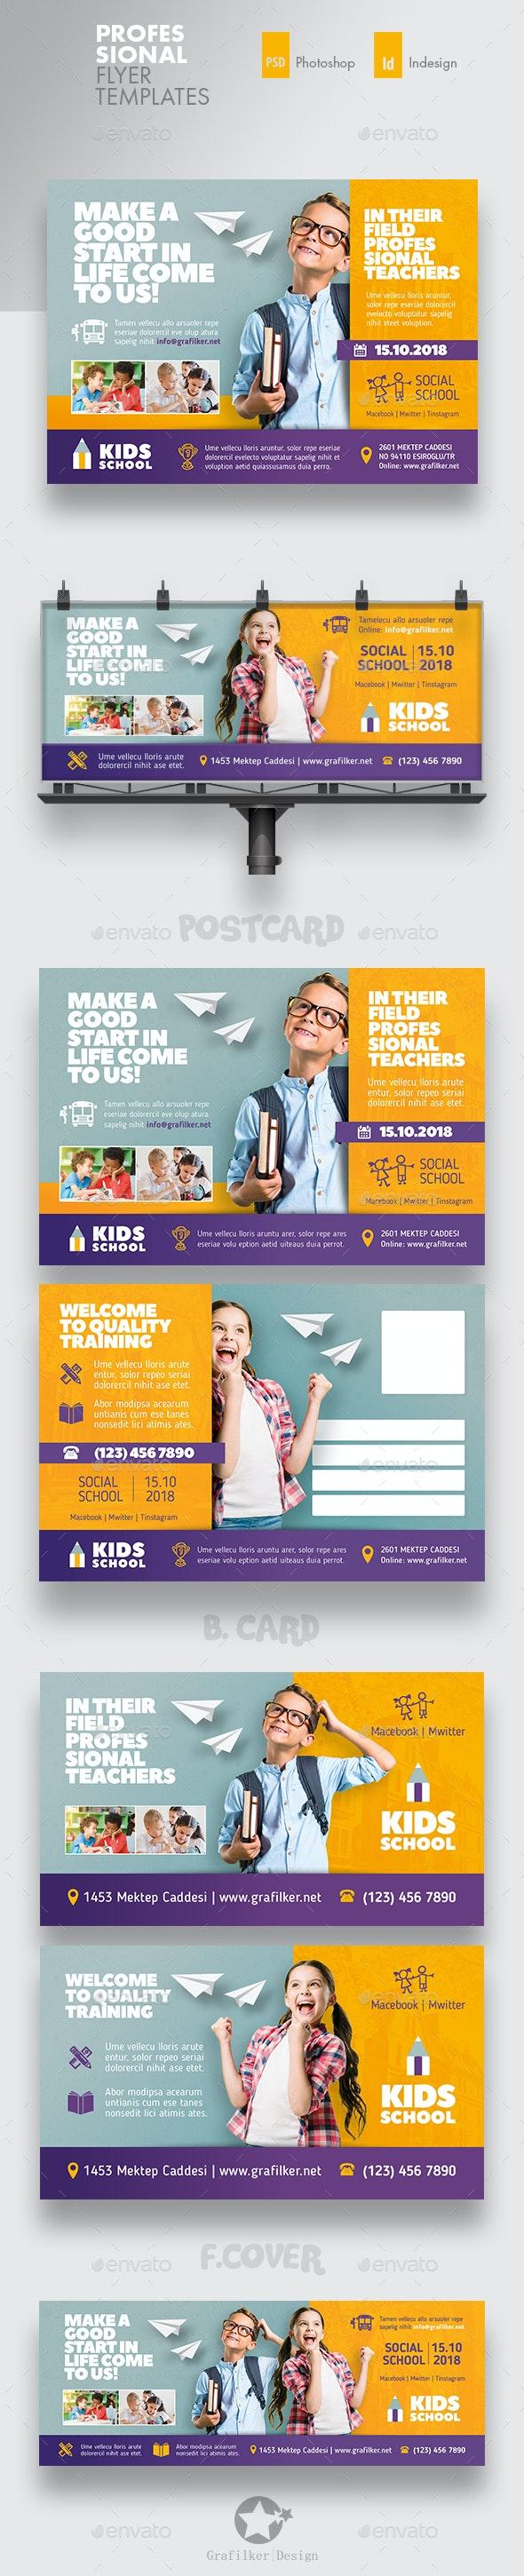 Kids School Bundle Templates - Corporate Flyers